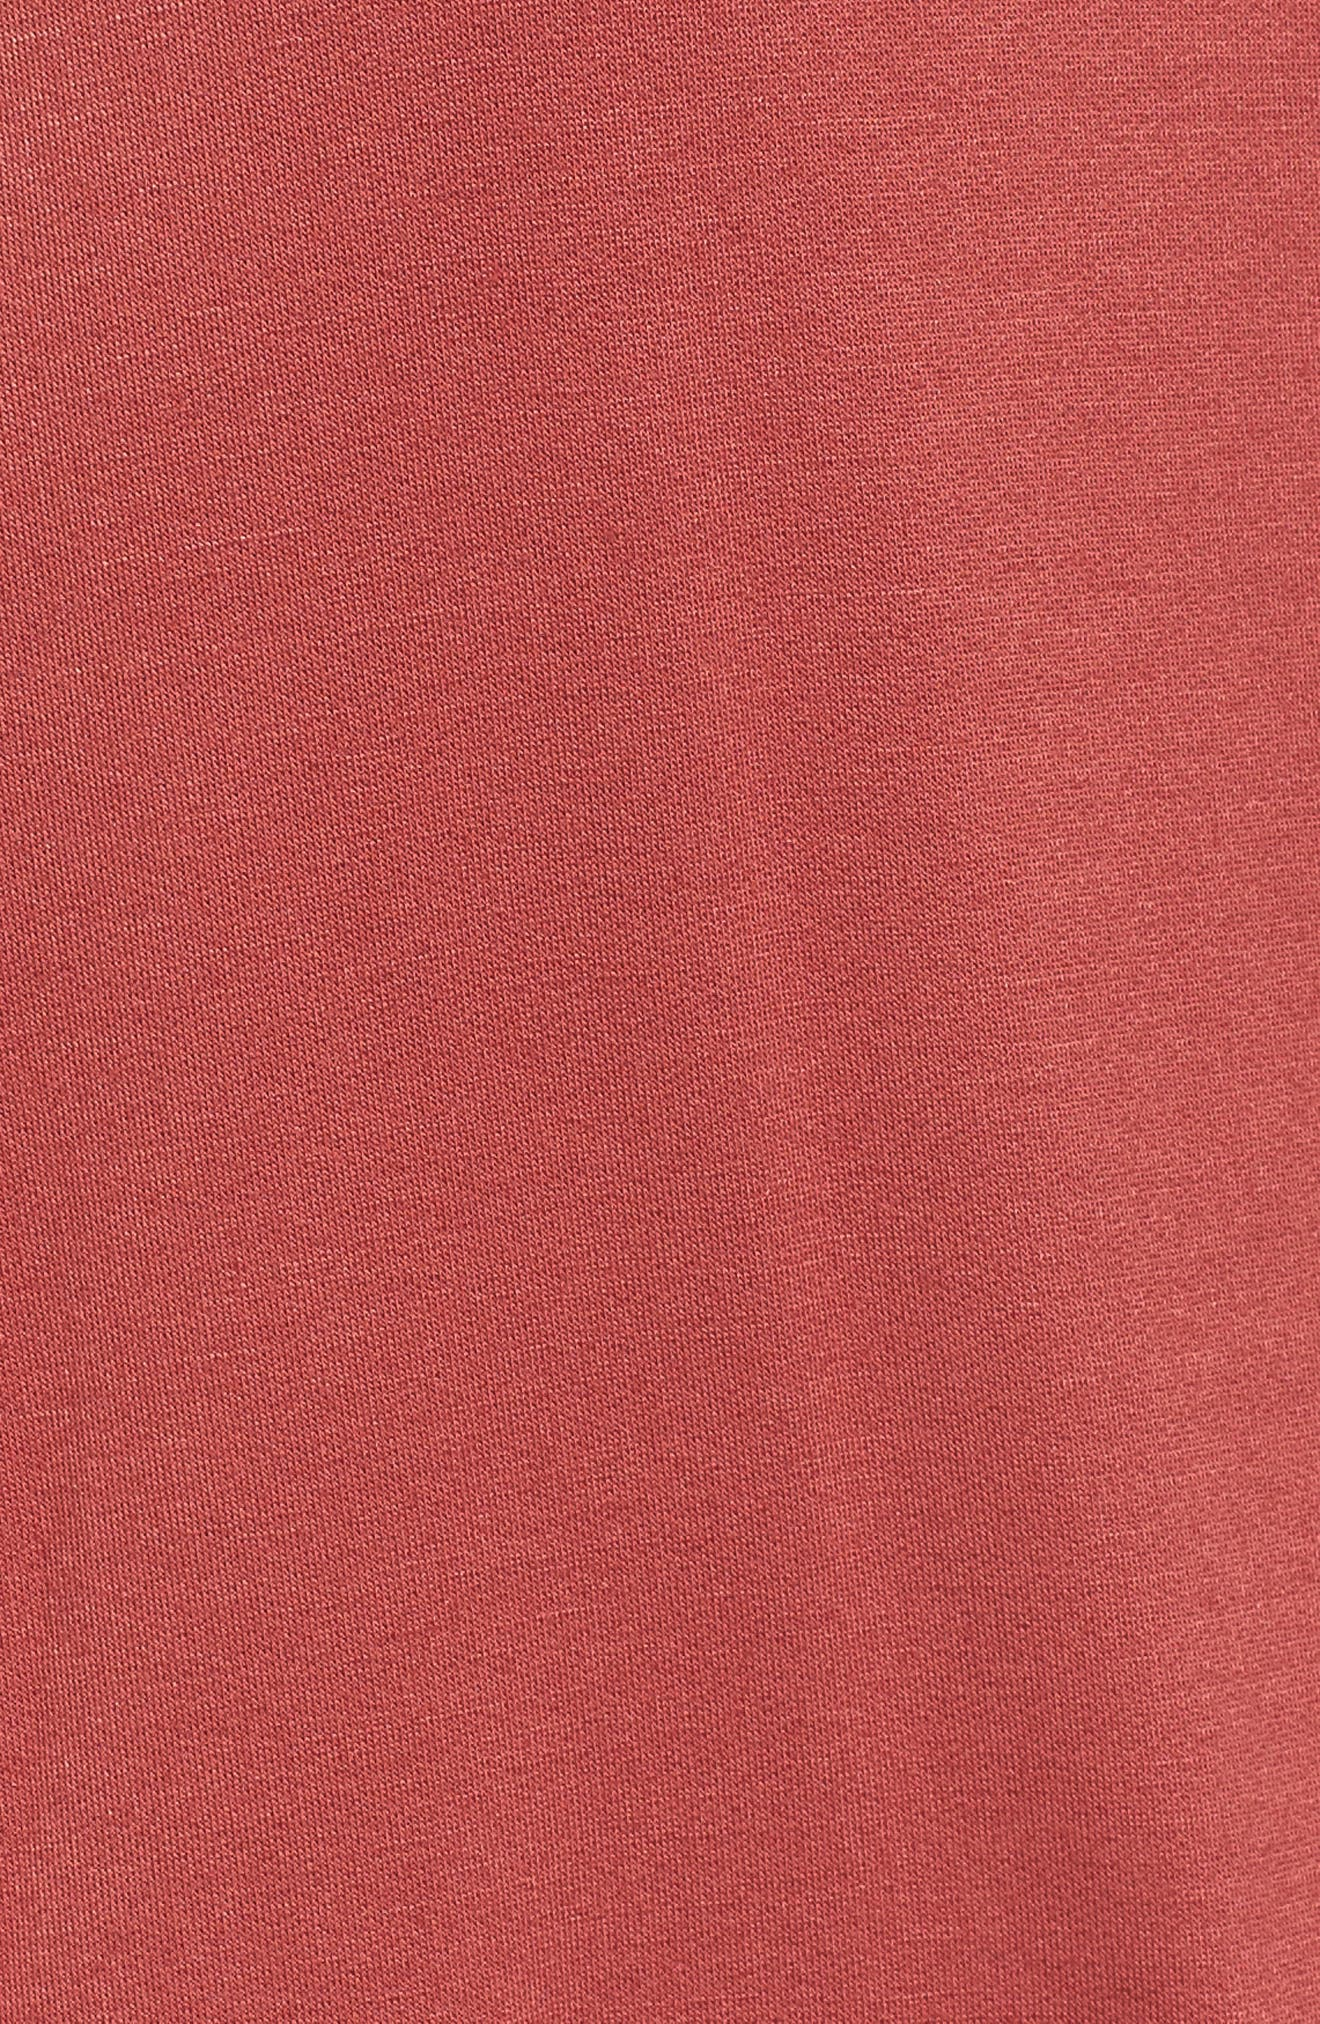 Lace Sleeve Sweatshirt,                             Alternate thumbnail 20, color,